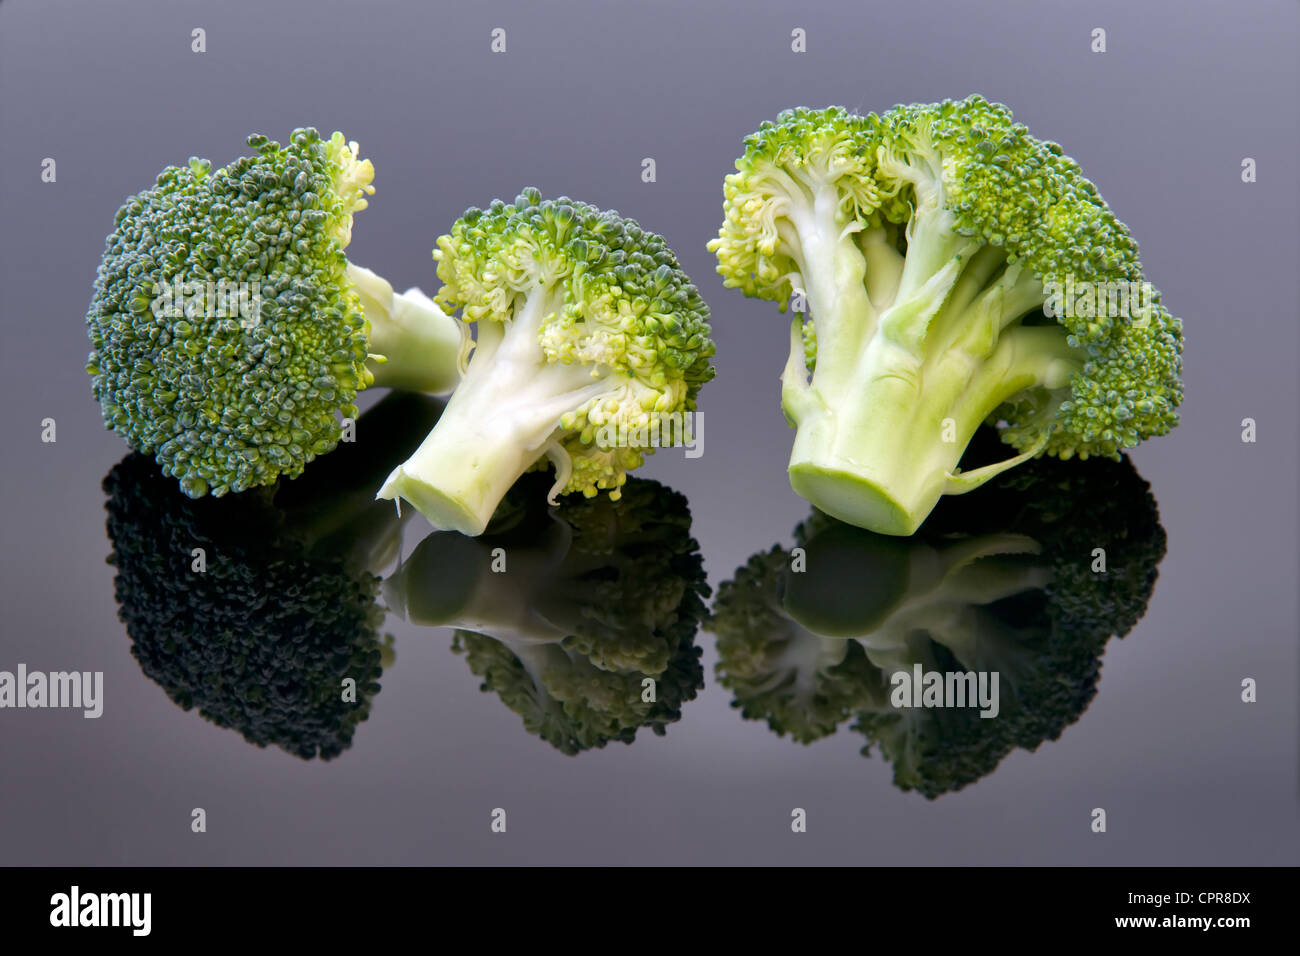 Studio image of fresh uncooked broccoli with reflection on black background - Stock Image